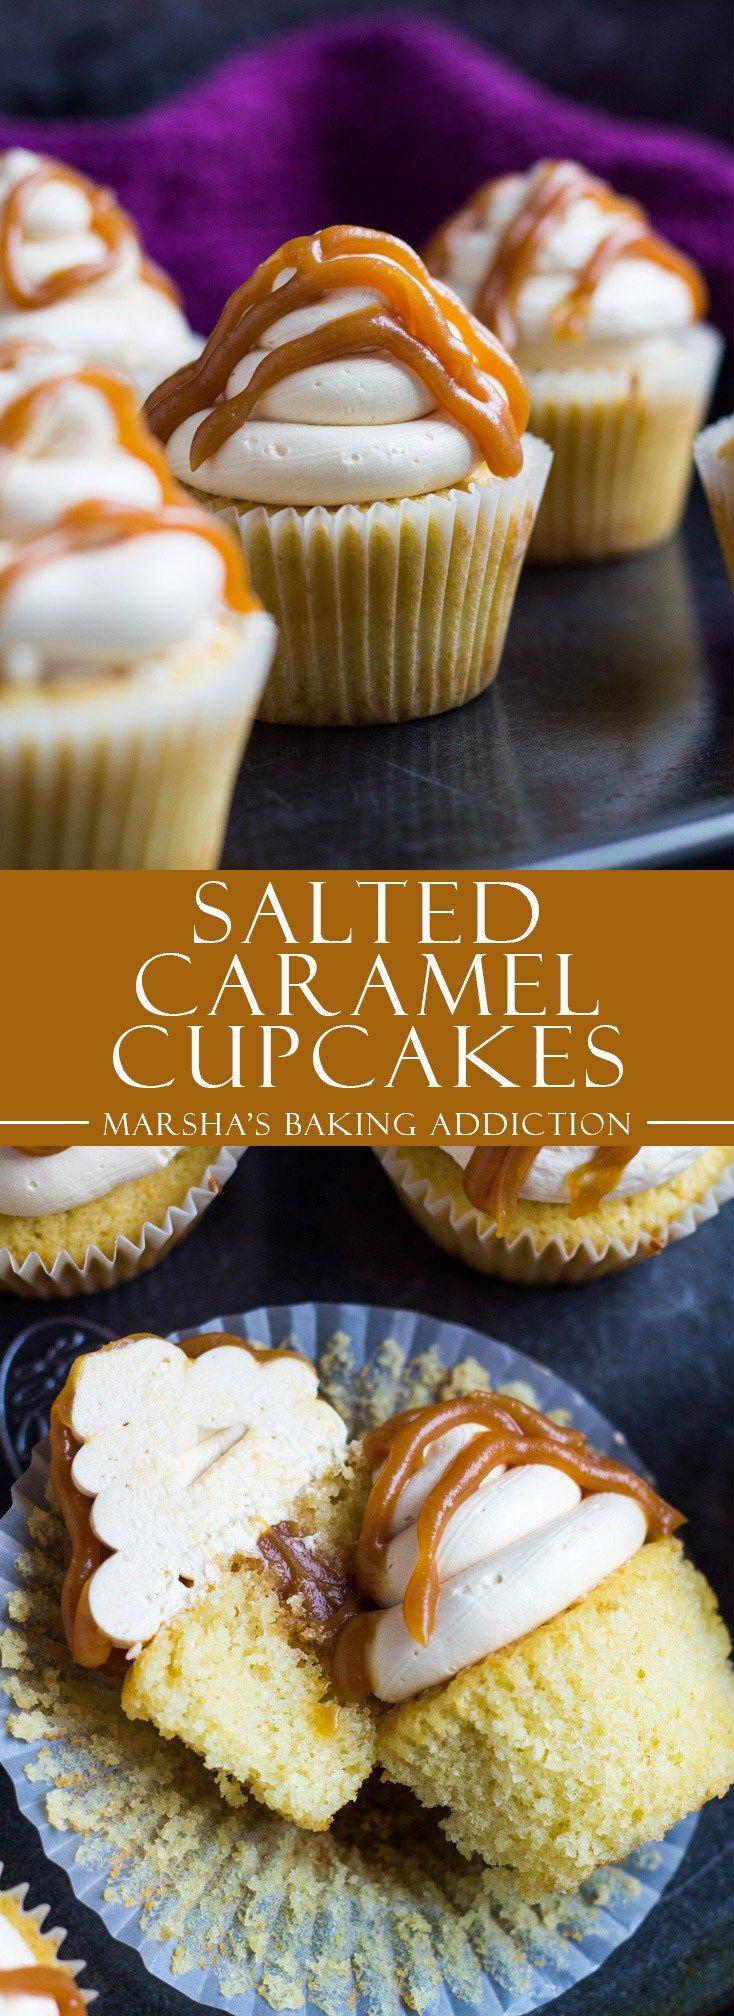 Salted Caramel Cupcakes   marshasbakingaddiction.com @marshasbakeblog